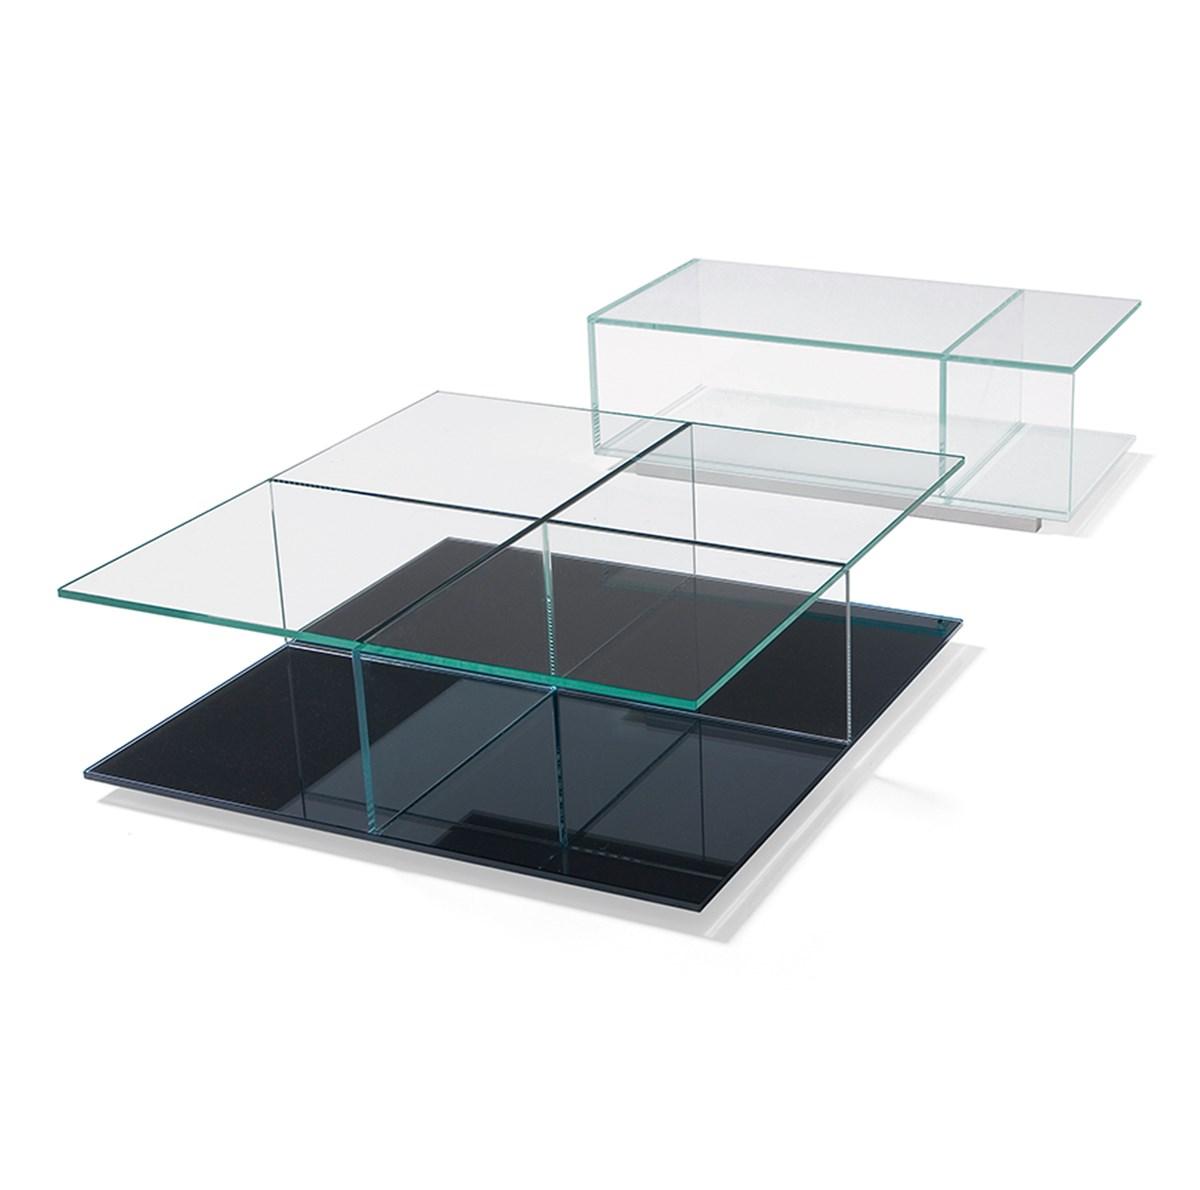 Cassina-Piero-Lissoni-Mex-Table-Matisse-1